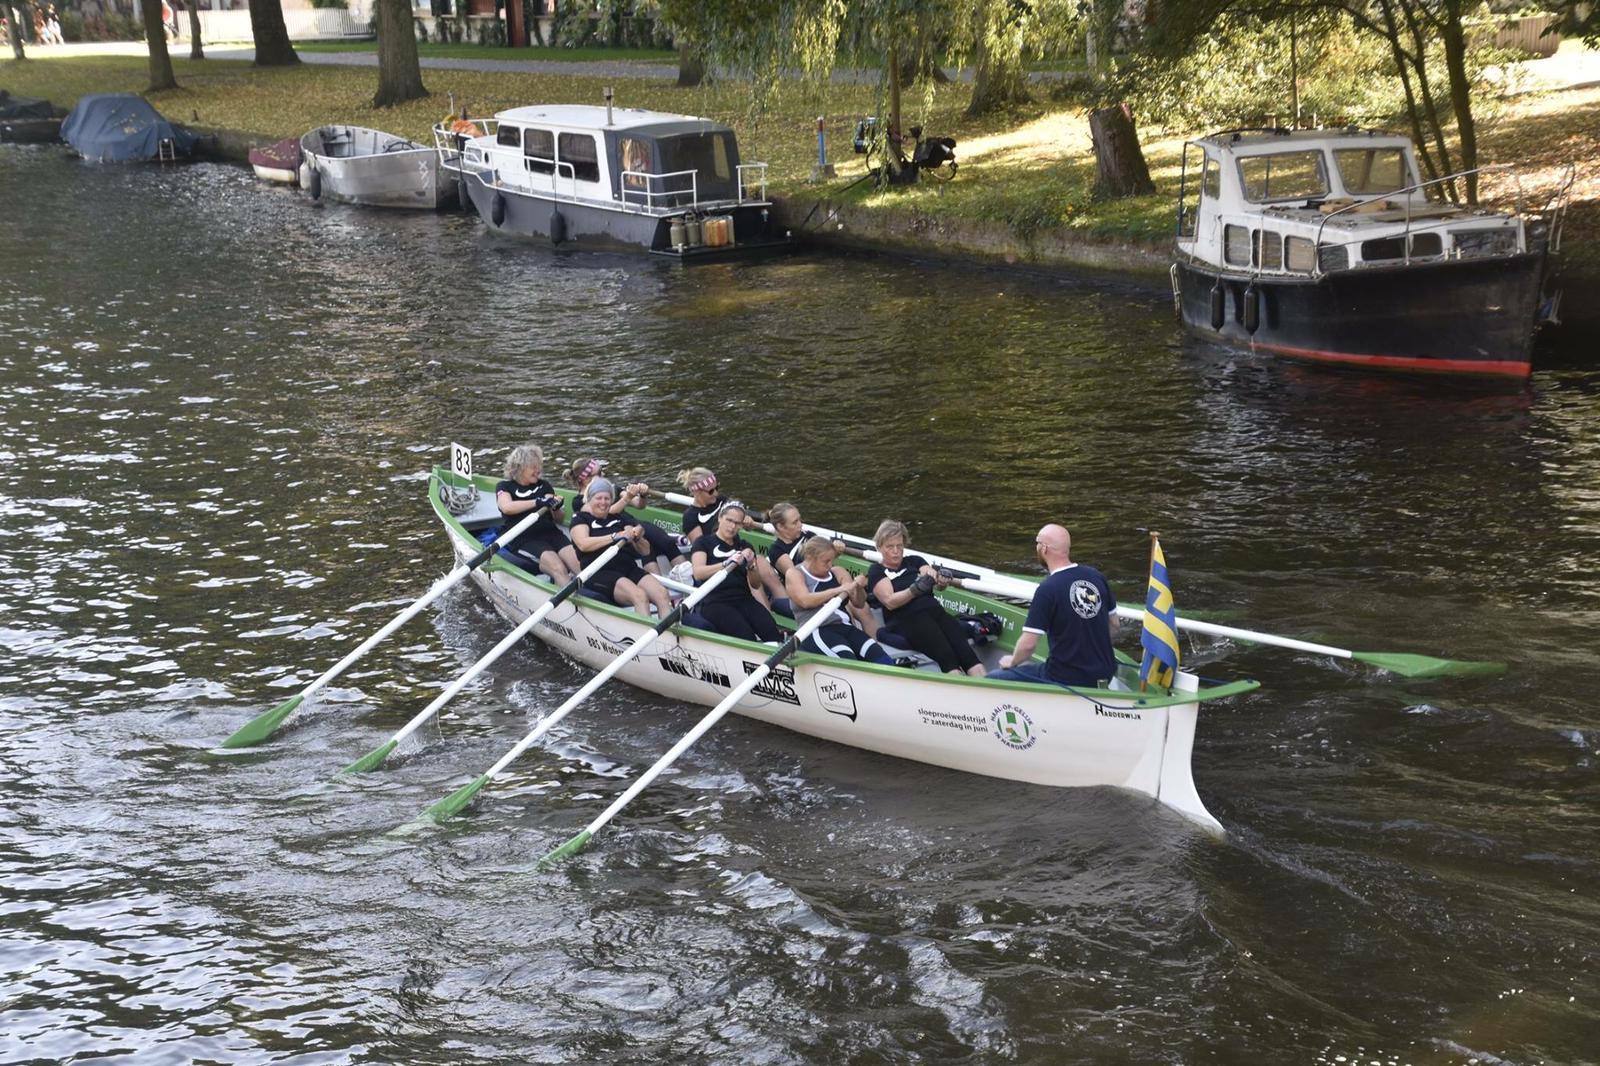 amsterdamse grachtenrace